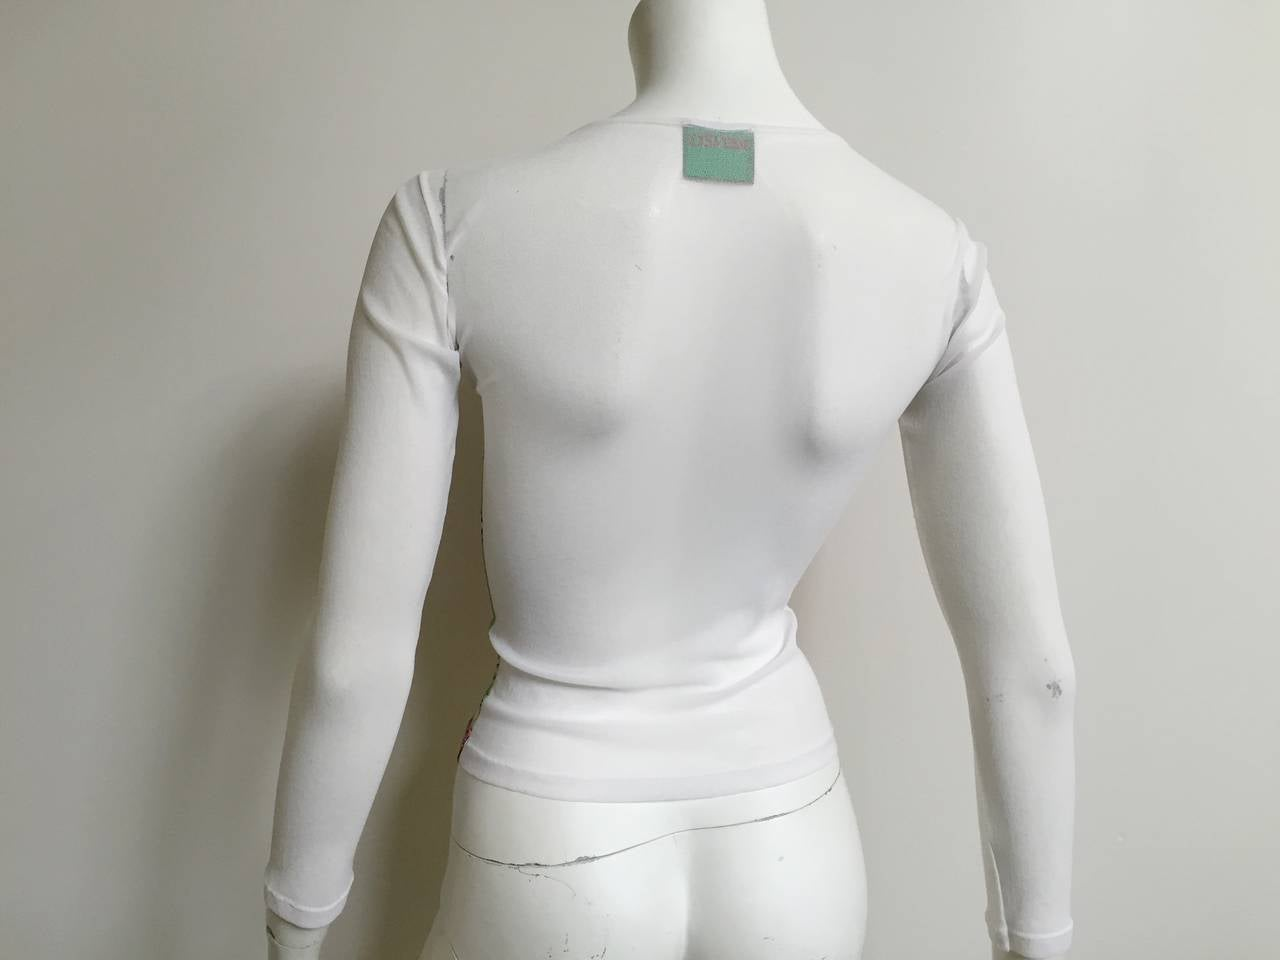 Kenzo Jungle Asian sheer long sleeve top size small. 6